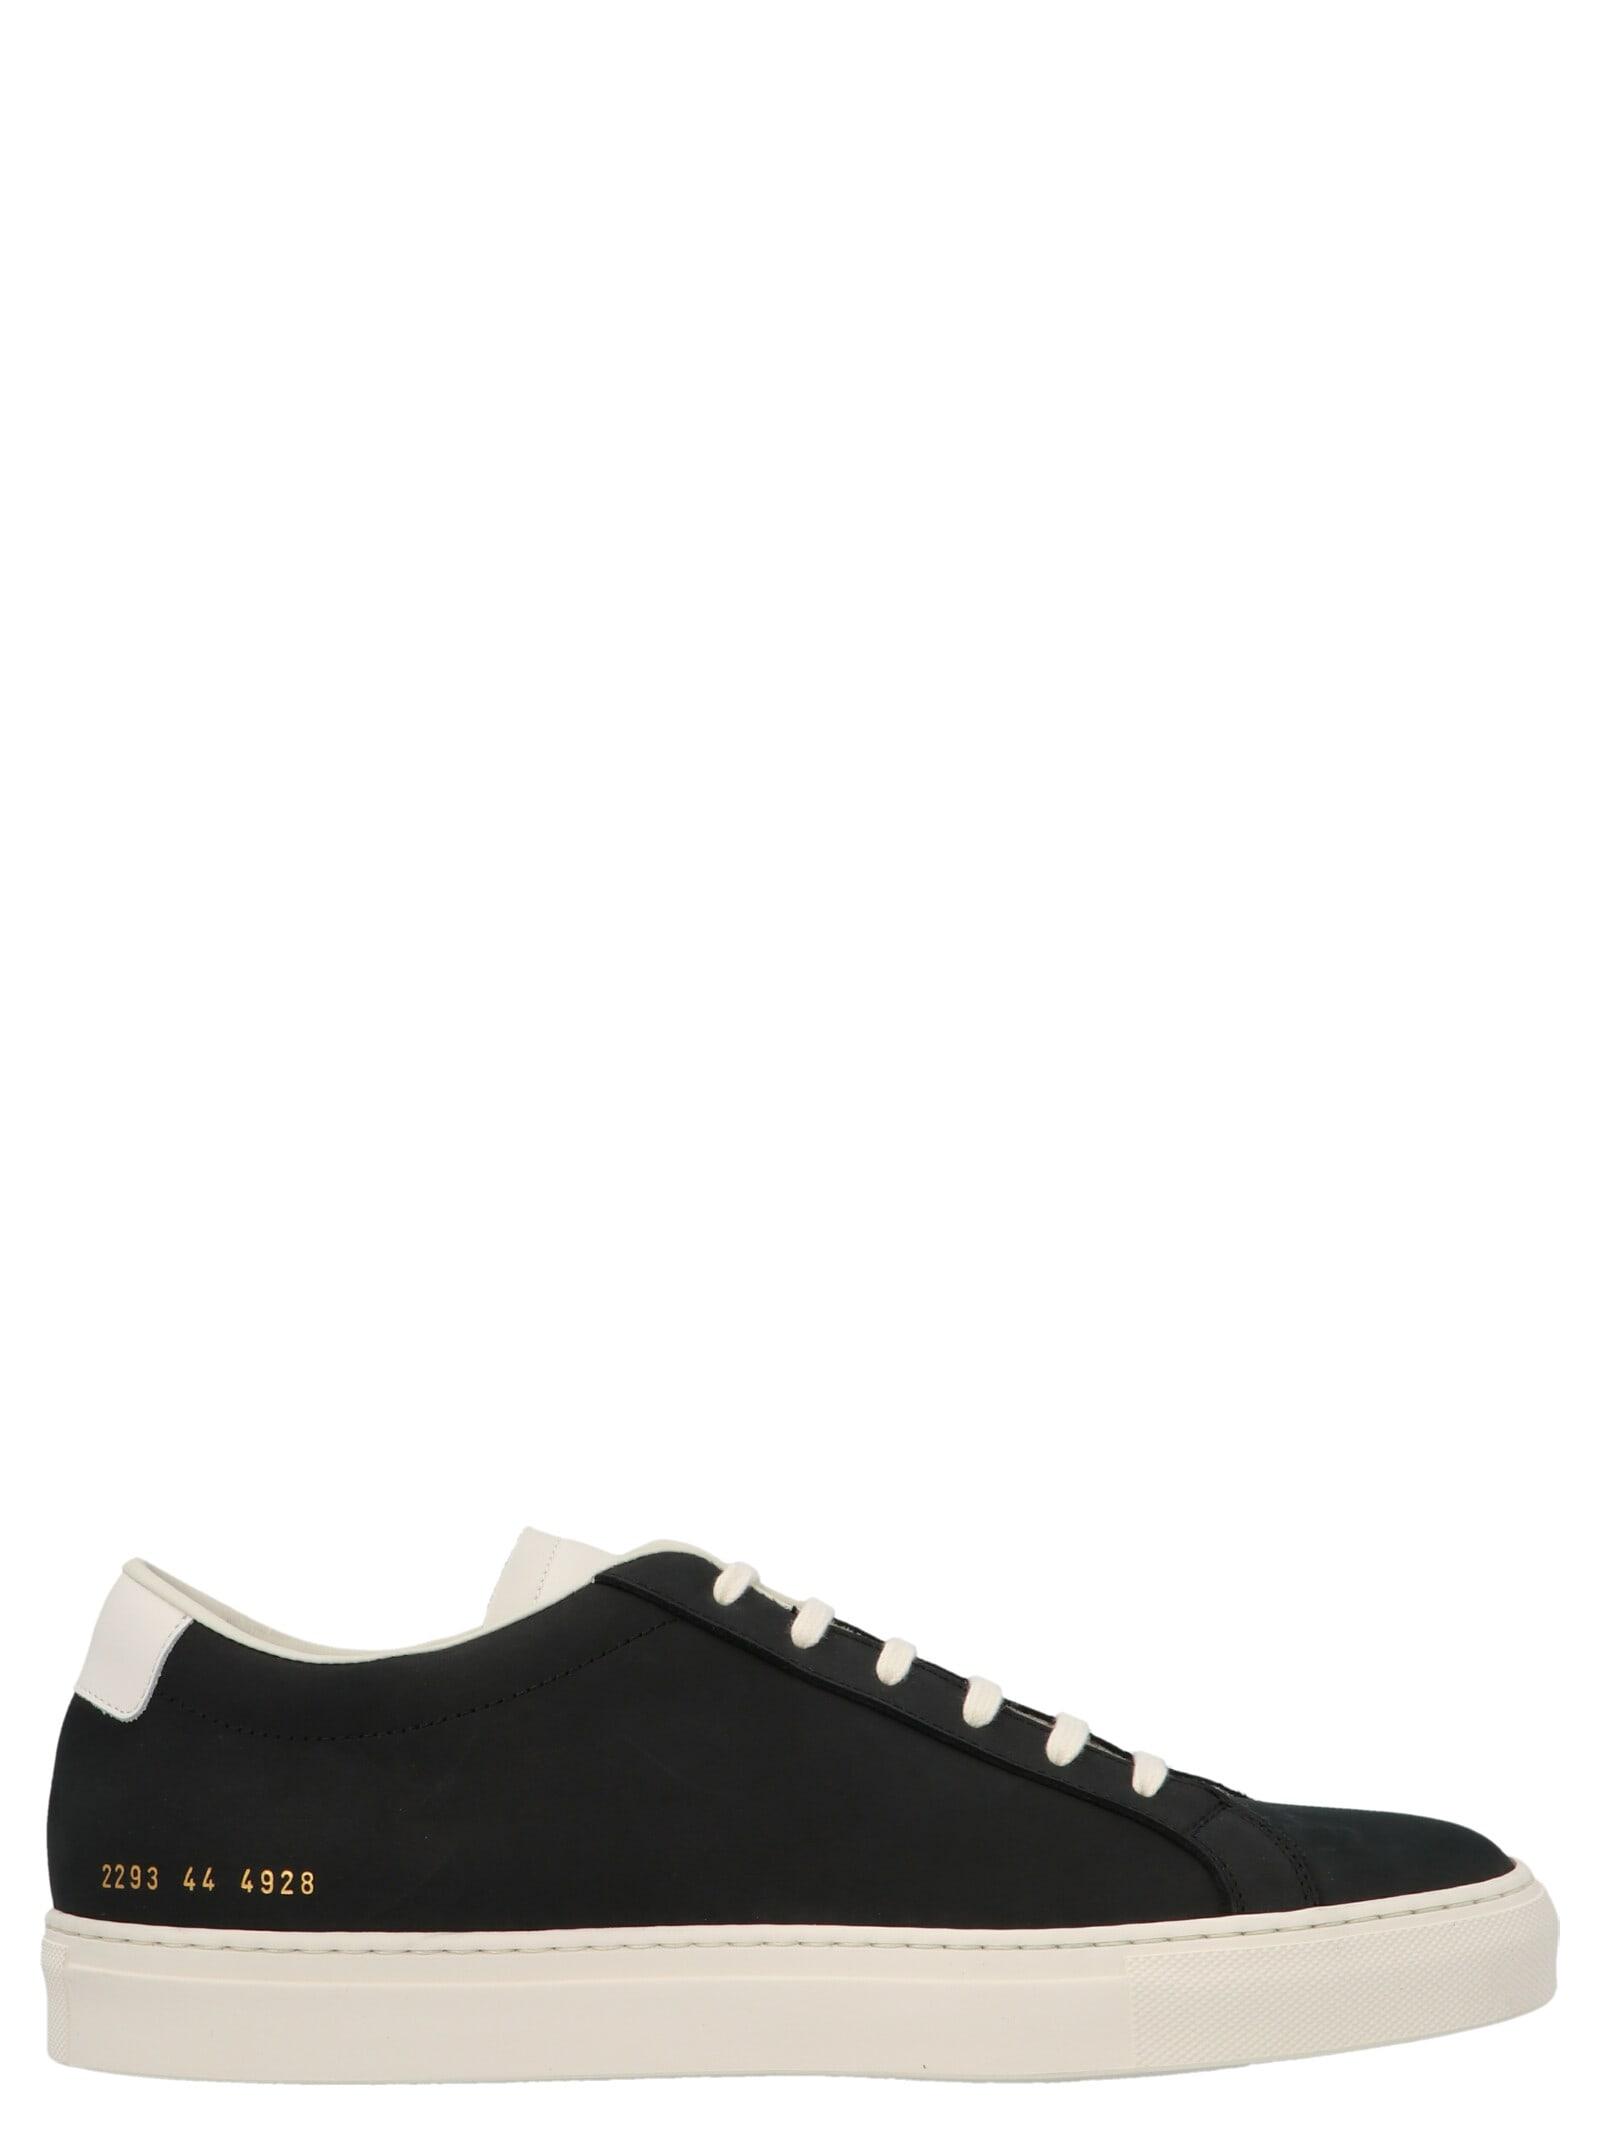 Common Projects achilles Fluo Shoes